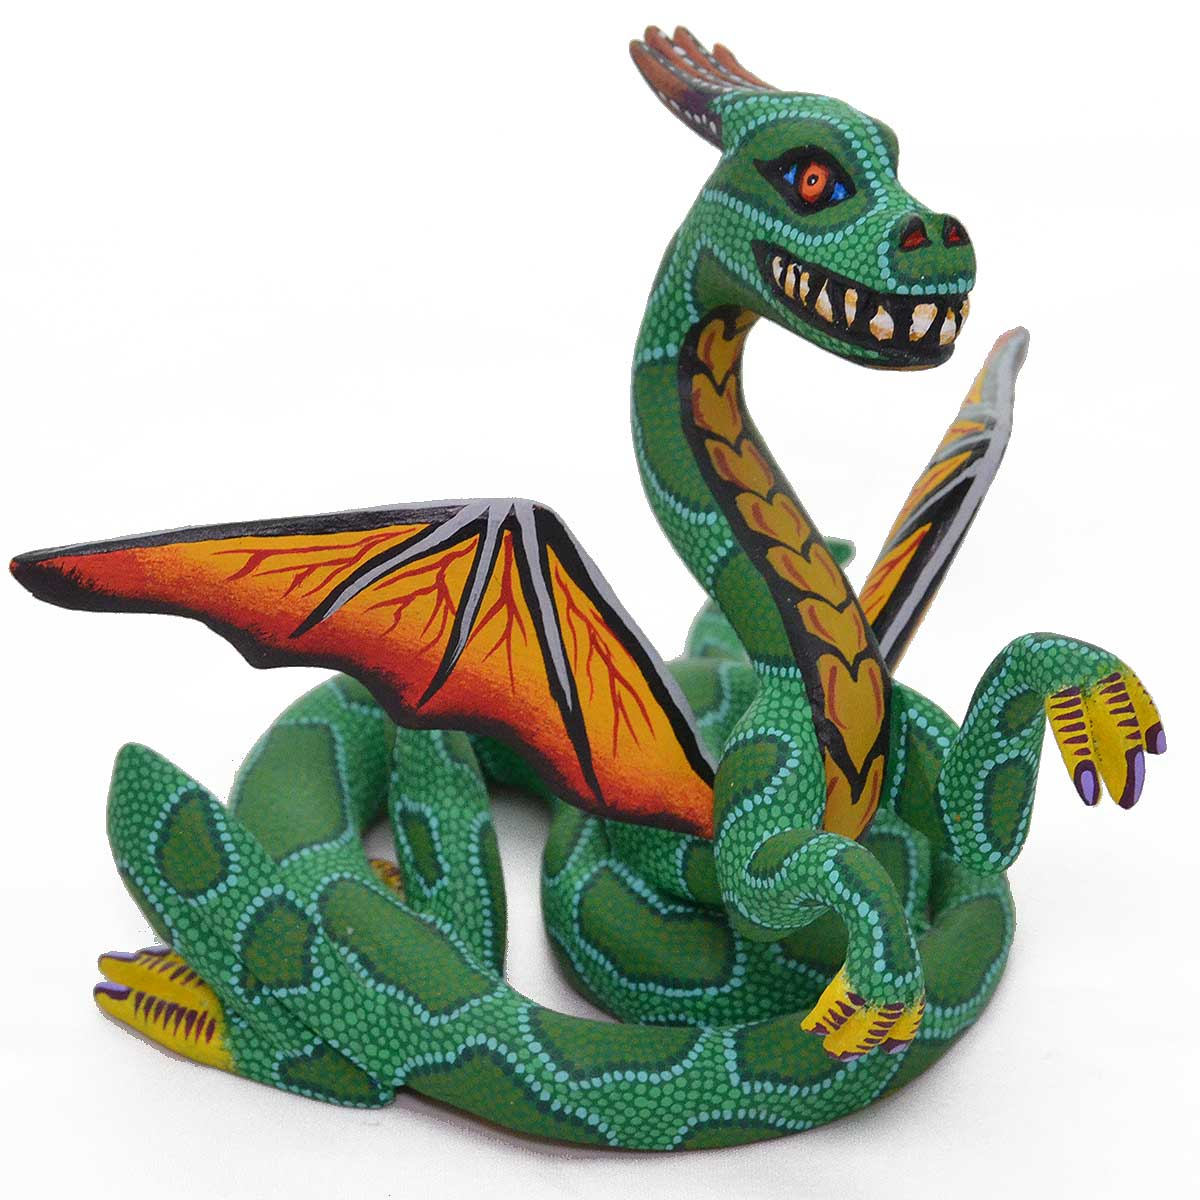 Eleazar Morales: Small Green Dragon